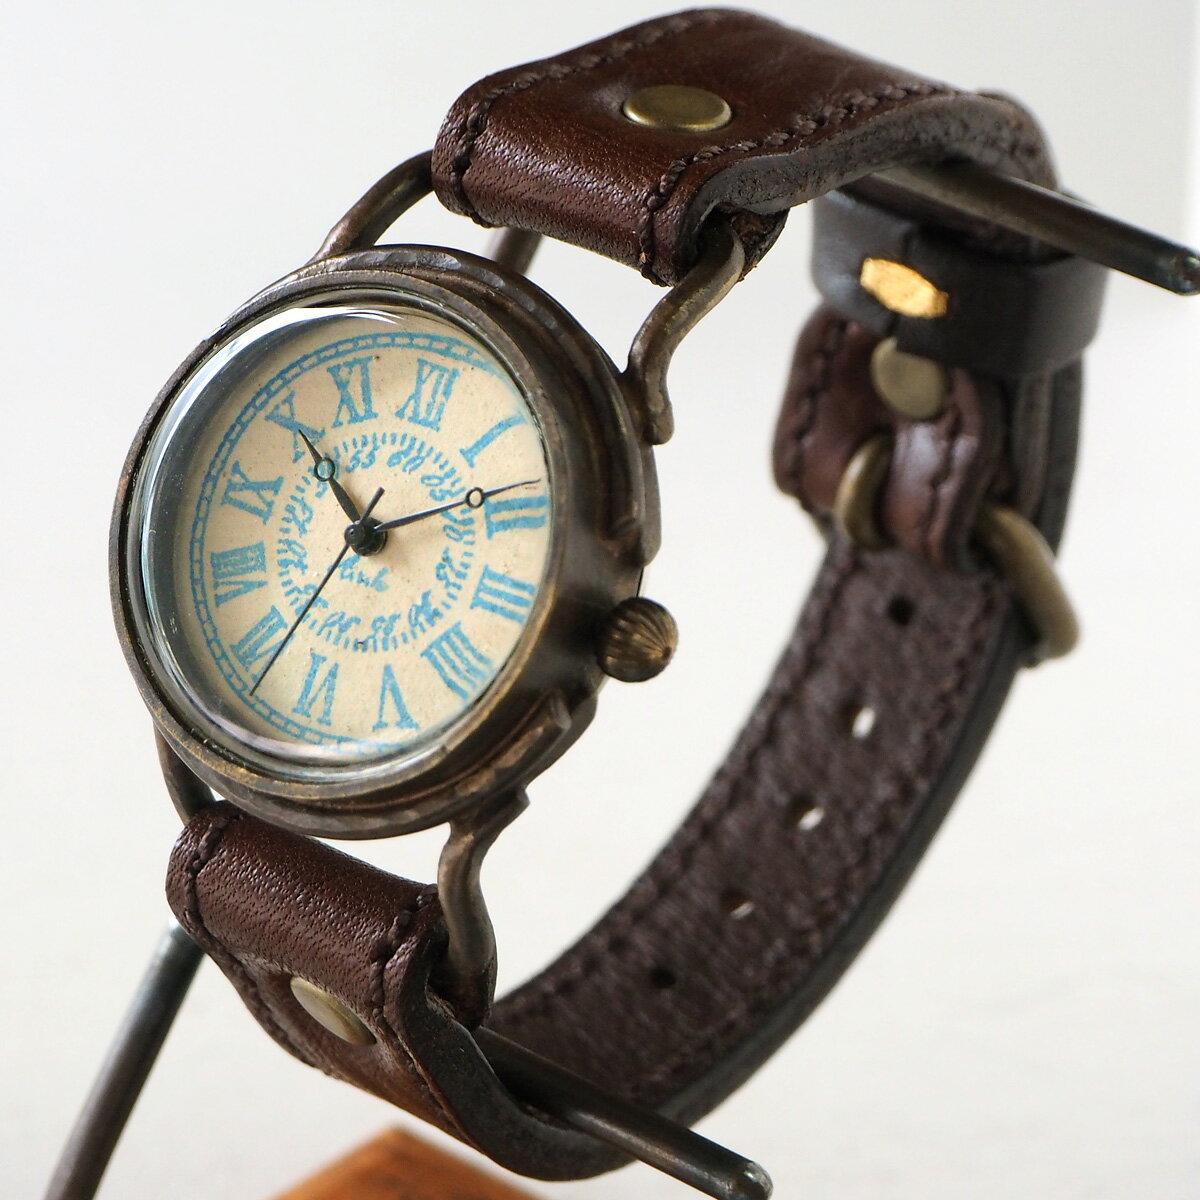 "ARKRAFT(アークラフト)手作り腕時計""Marvin Medium"" ローマ数字 プレミアムストラップ [AR-C-012-RO] 時計作家 新木秀和 ハンドメイドウォッチ ハンドメイド腕時計 手作り時計 本革ベルト 手描き スタンプ 真鍮 クオーツ アナログ 日本製 国産"